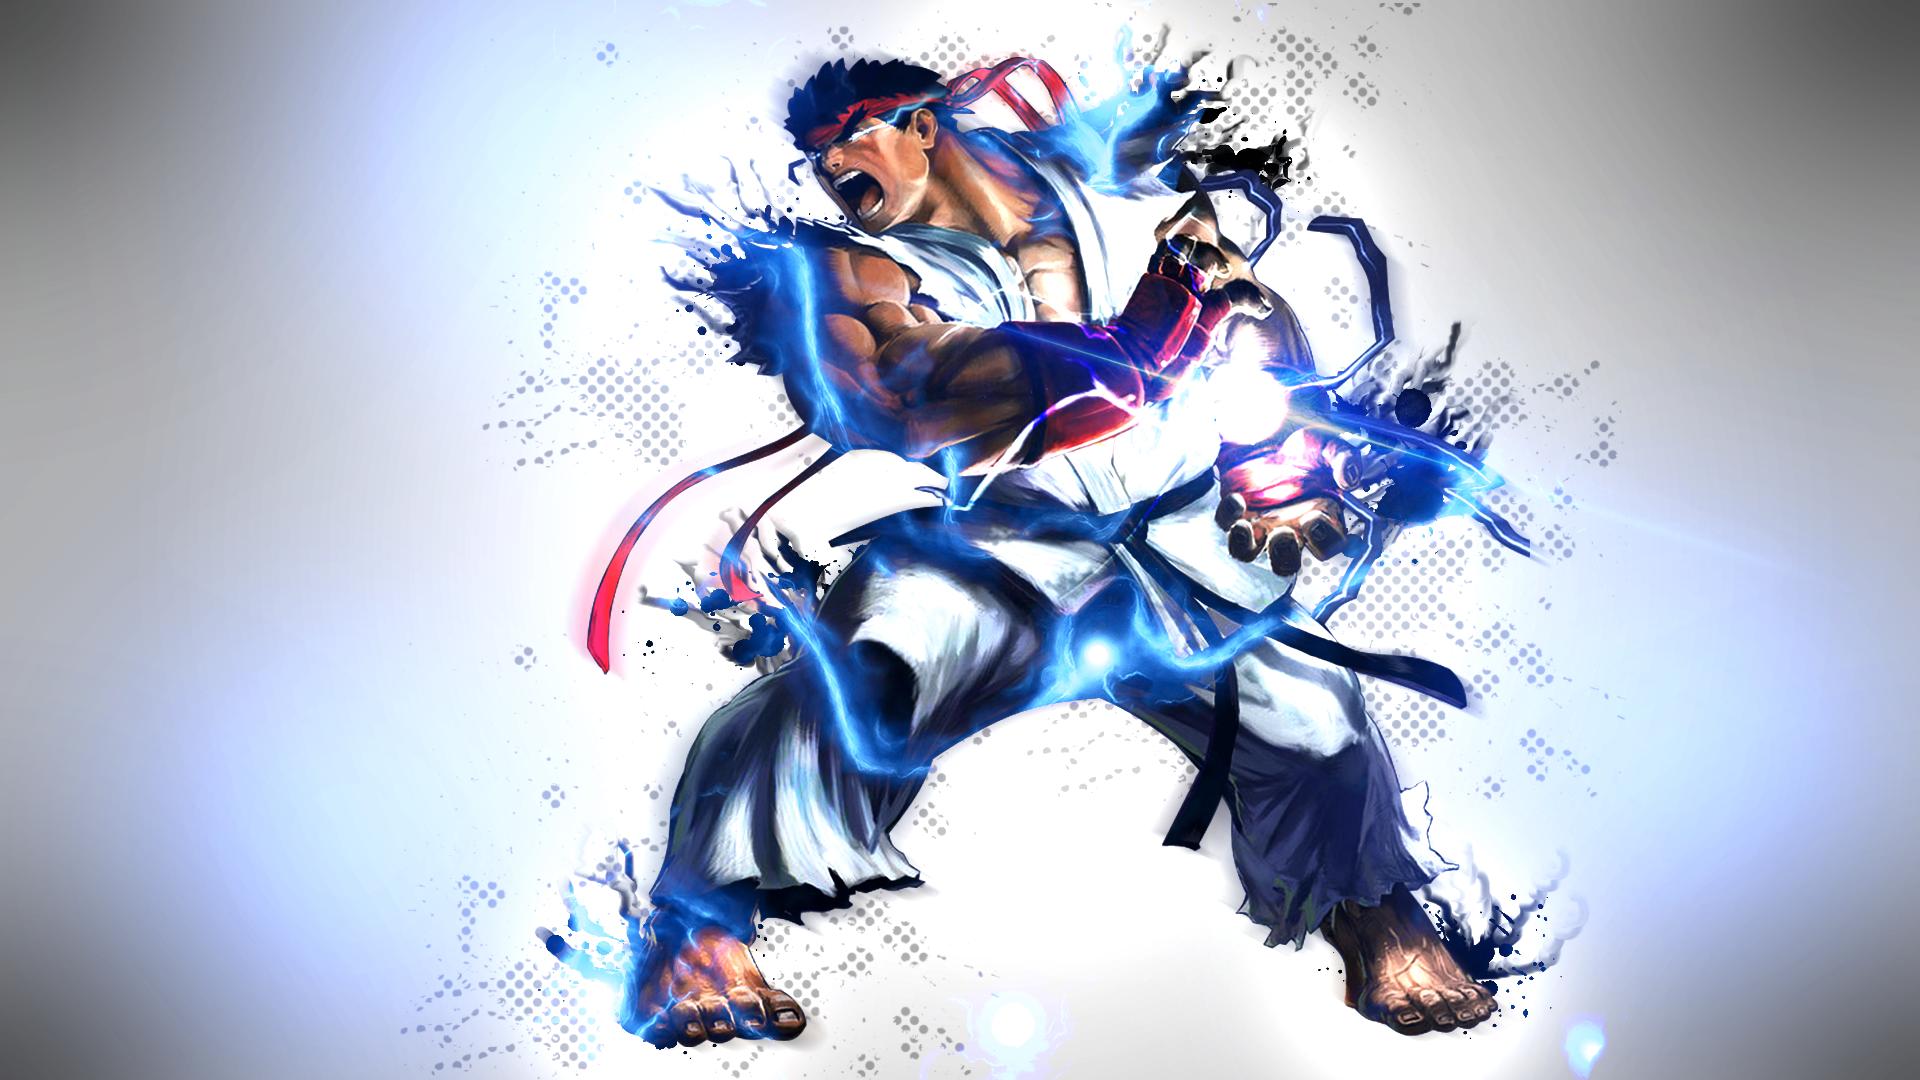 73 Ryu Wallpaper On Wallpapersafari